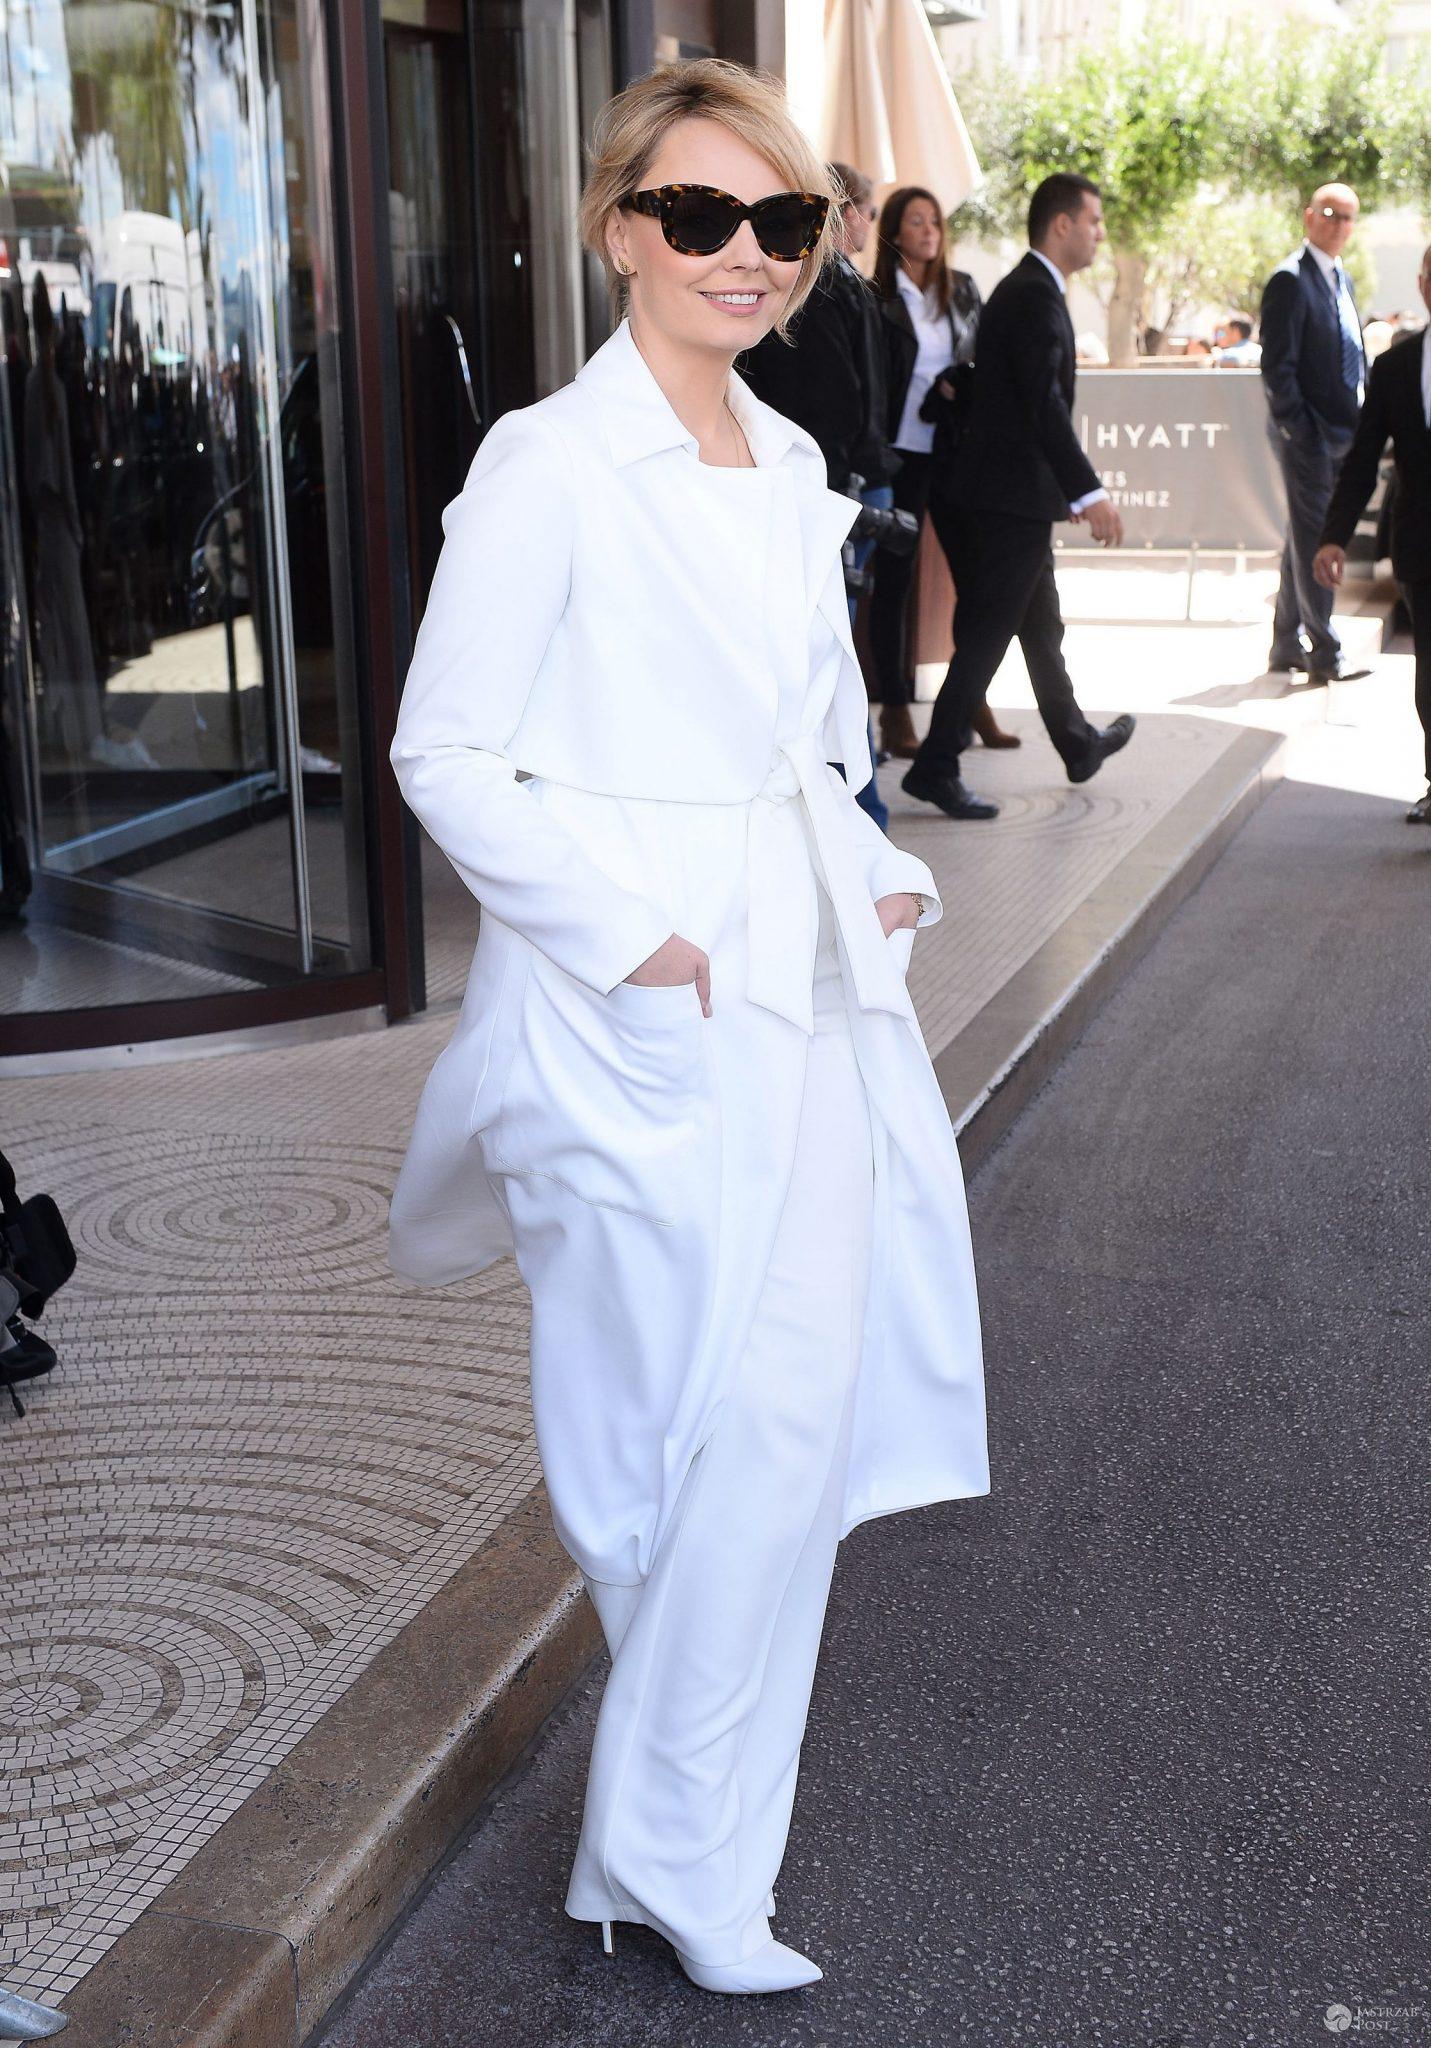 Kreacja: Marlu. Agnieszka Jastrzębska na festiwalu w Cannes 2016 (fot. ONS)